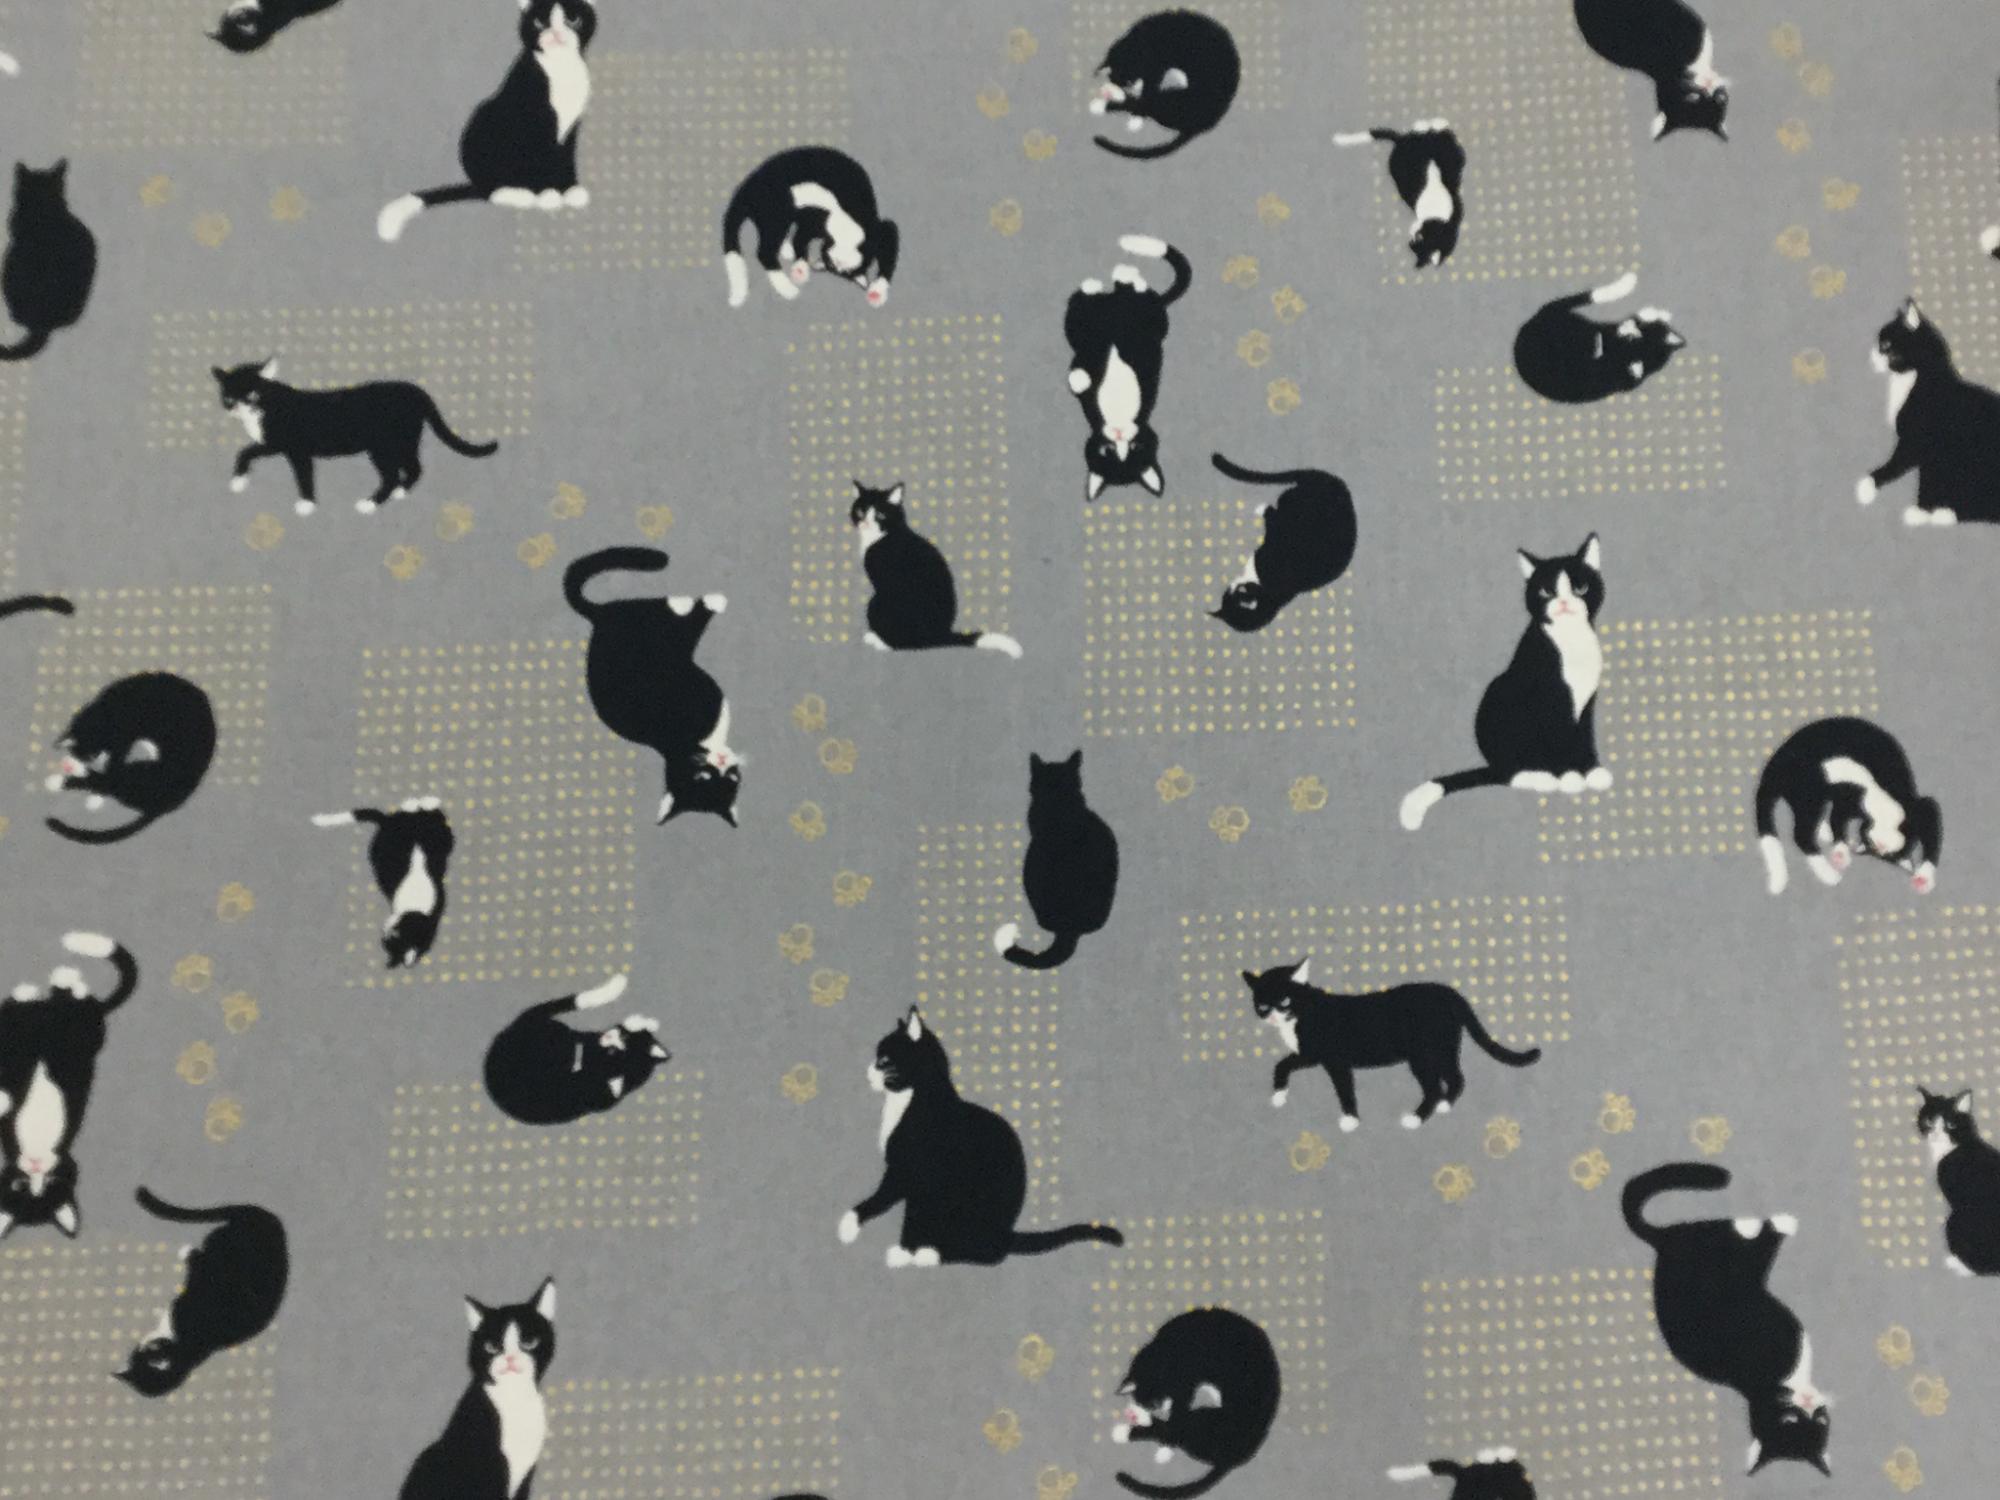 Kitty Cat Kitten Neko Japanese Asian Retro Cotton Quilt Fabric NT32